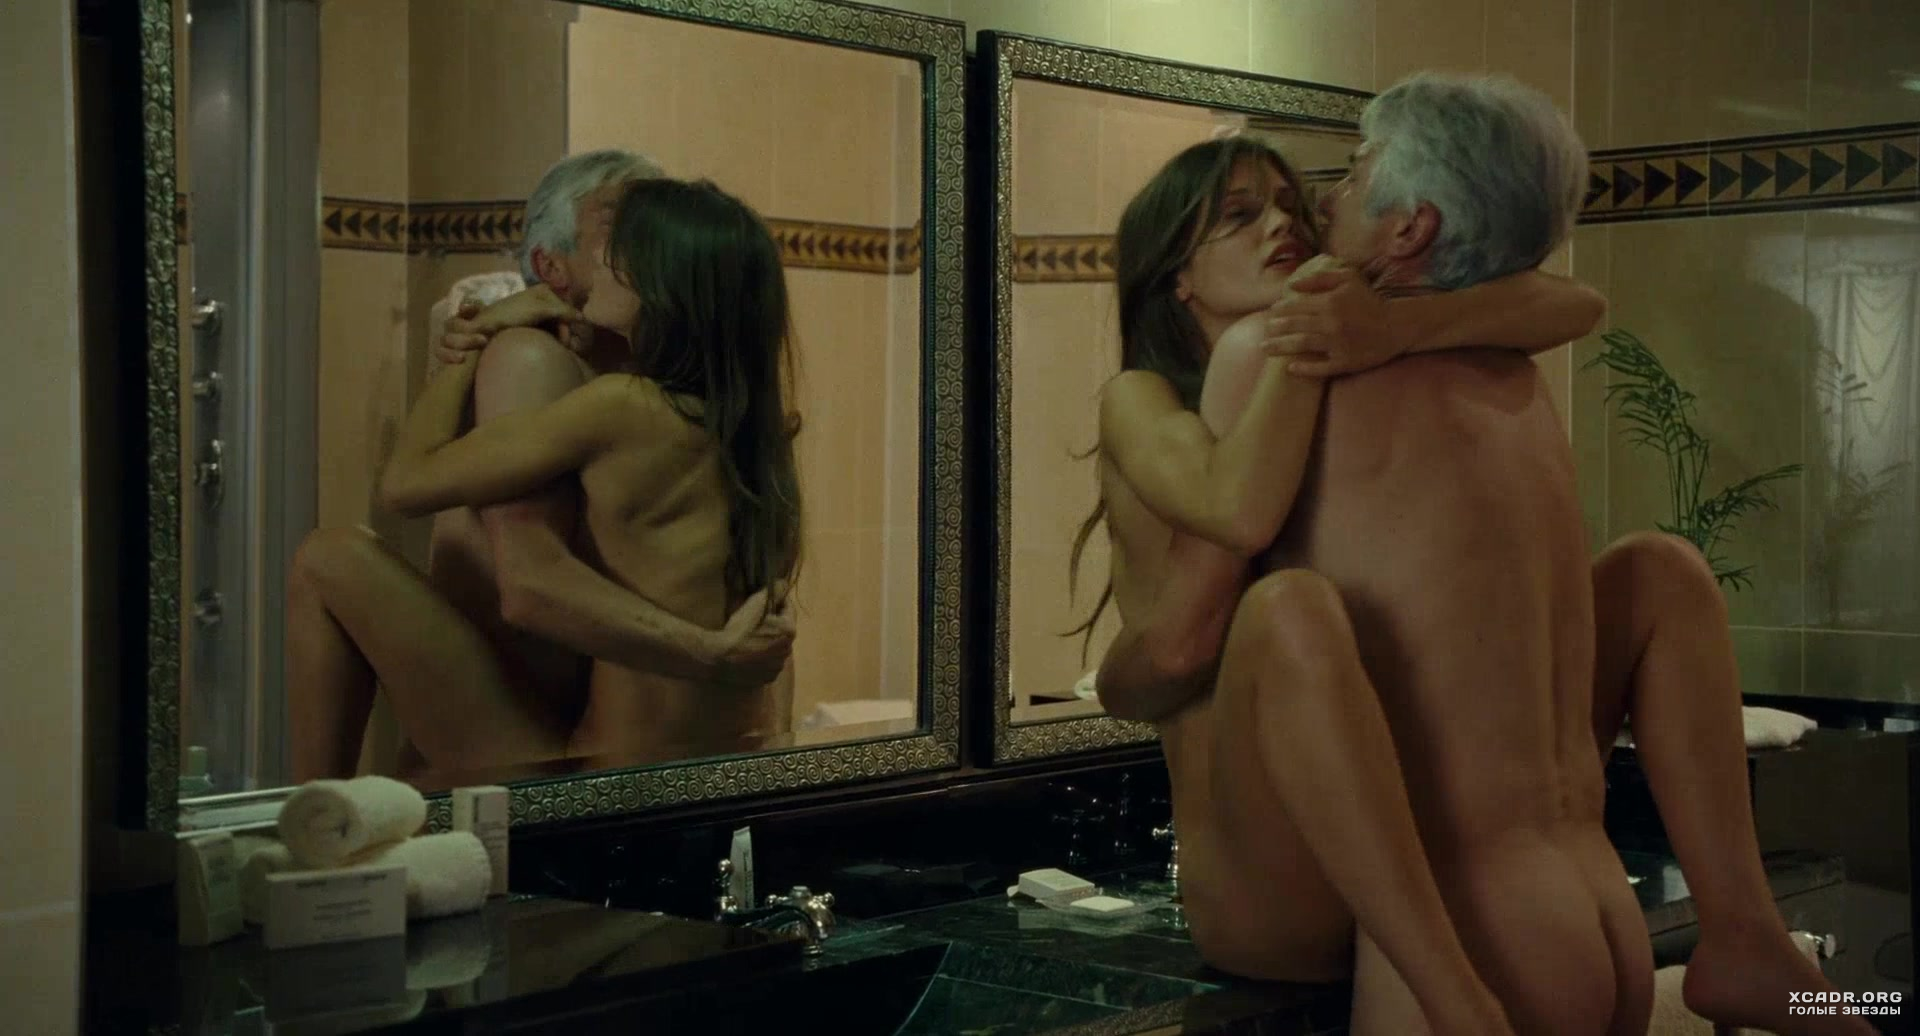 франция актрисы порно сцены